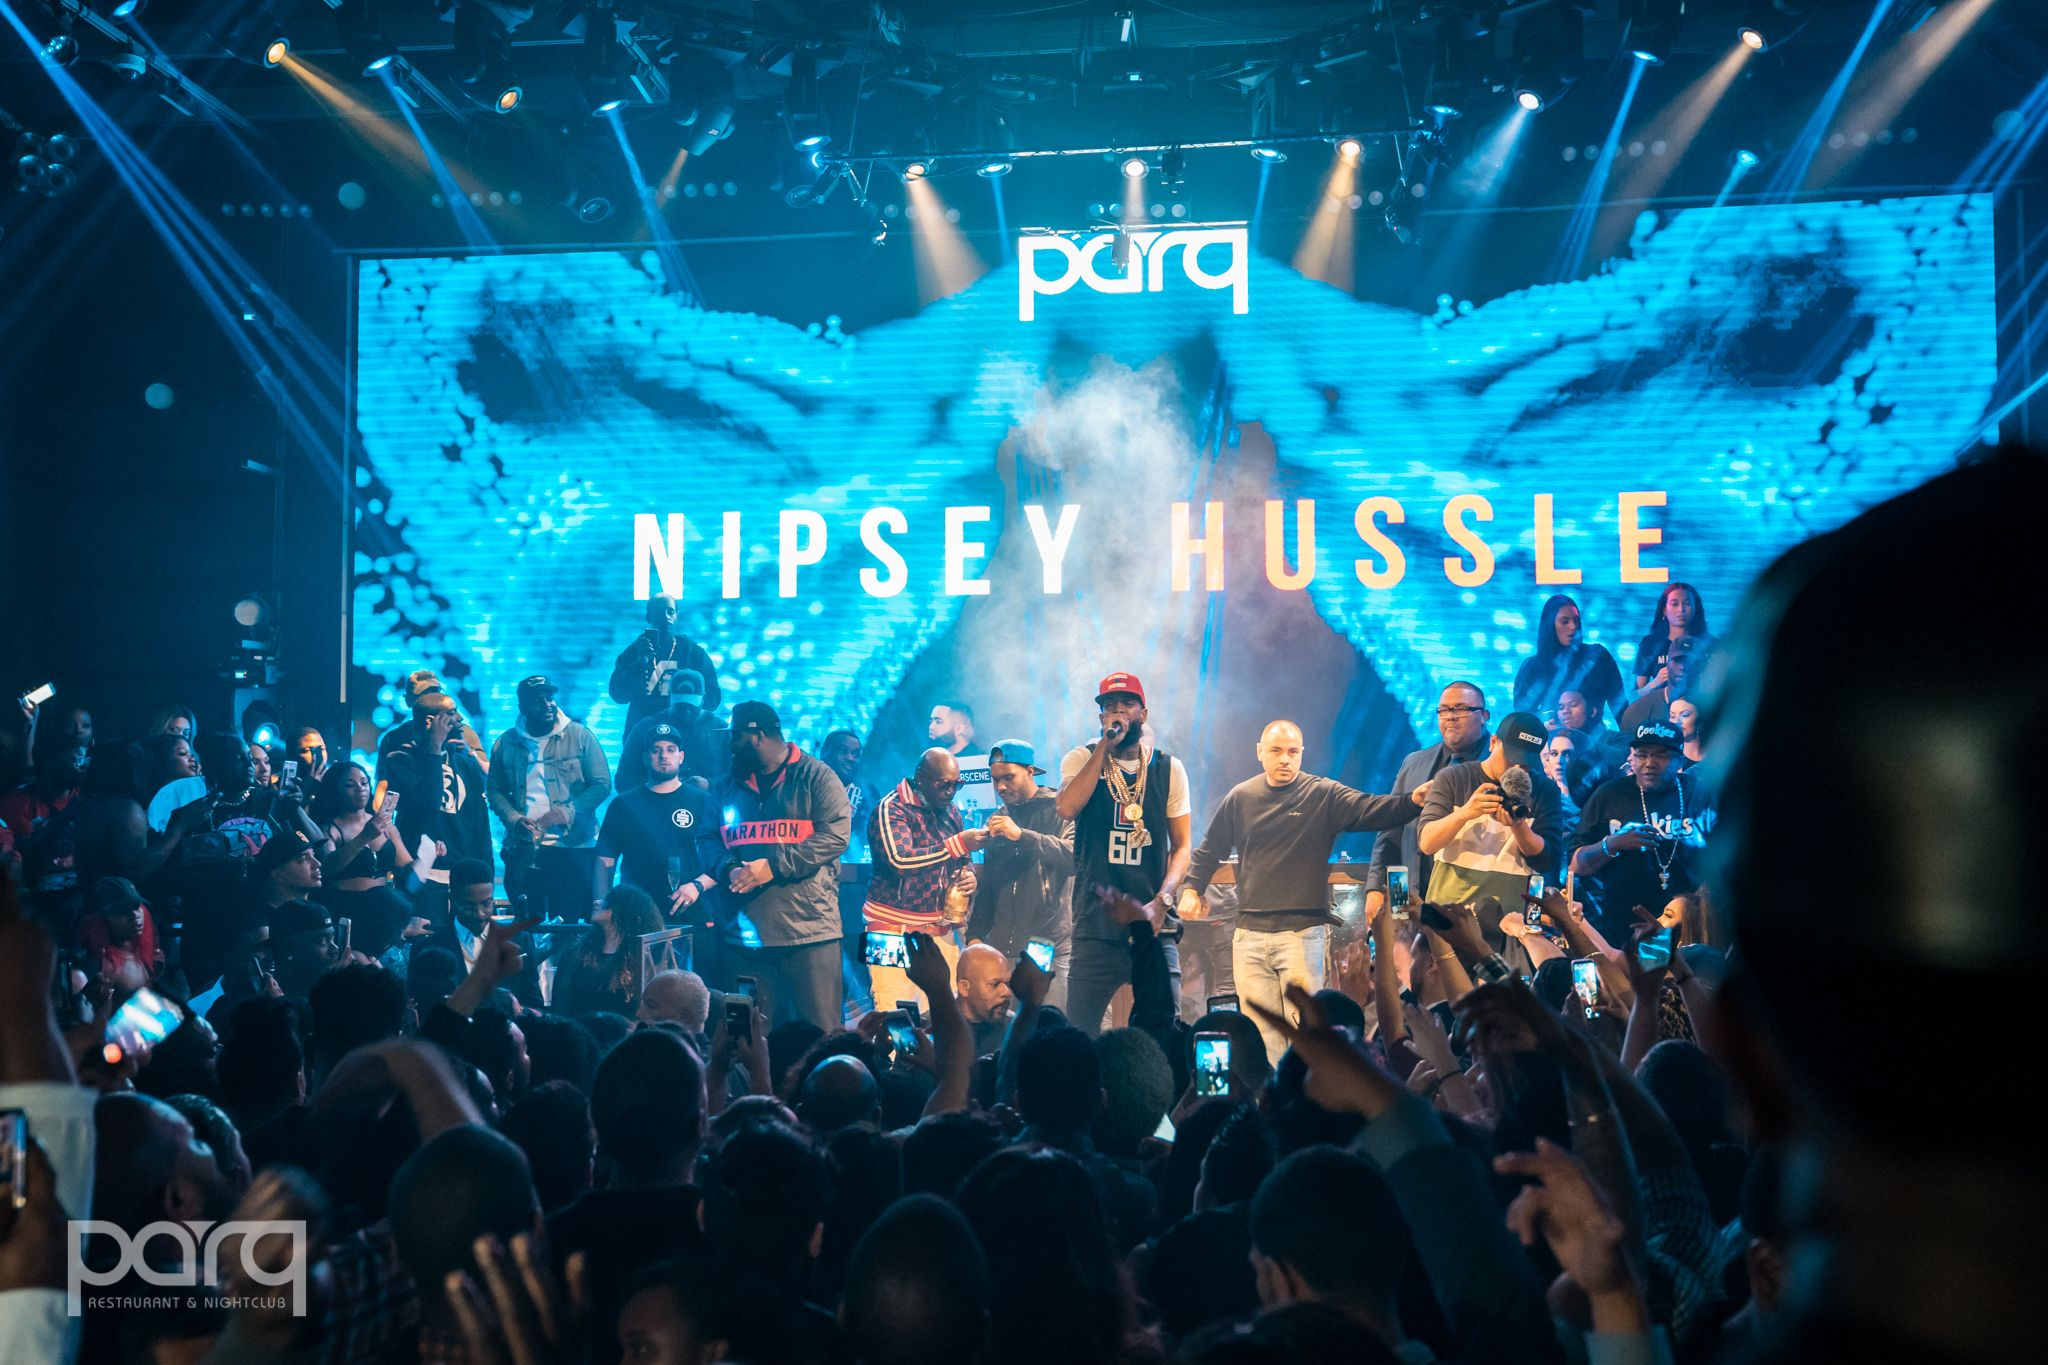 03.09.18 Parq - Nipsey Hussle-1.jpg